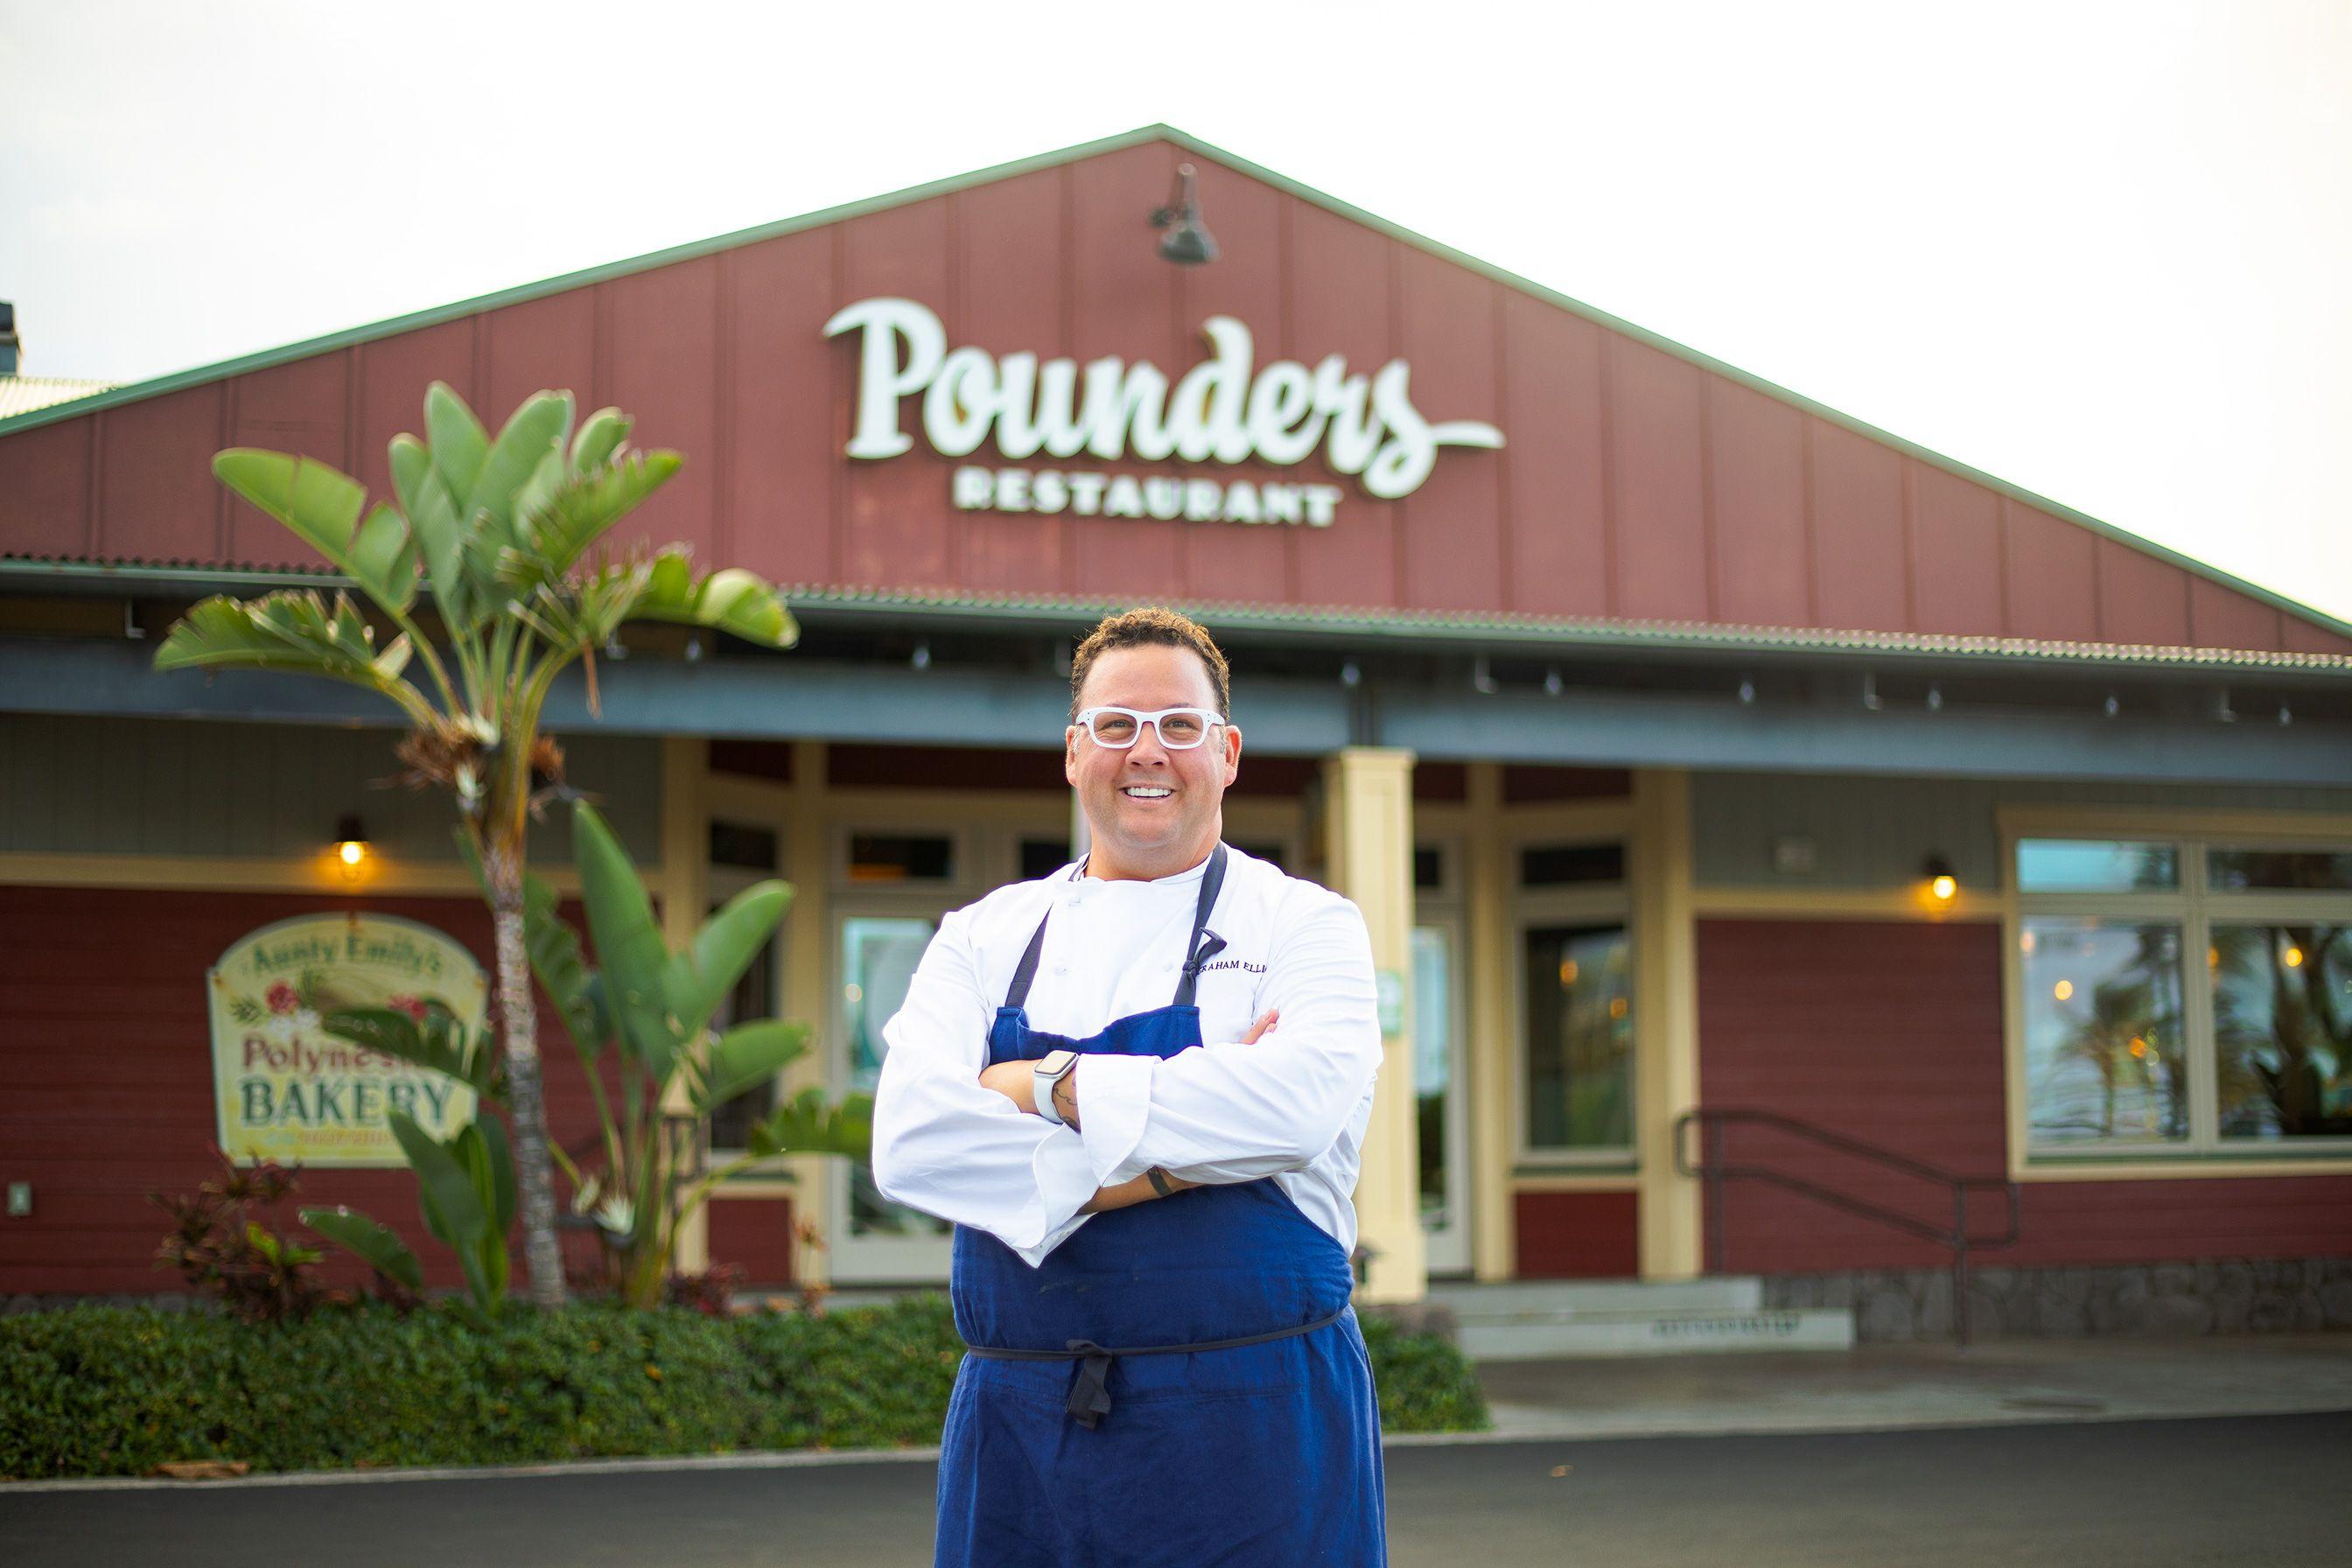 Graham Elliotnamed Executive Chef at Pounders